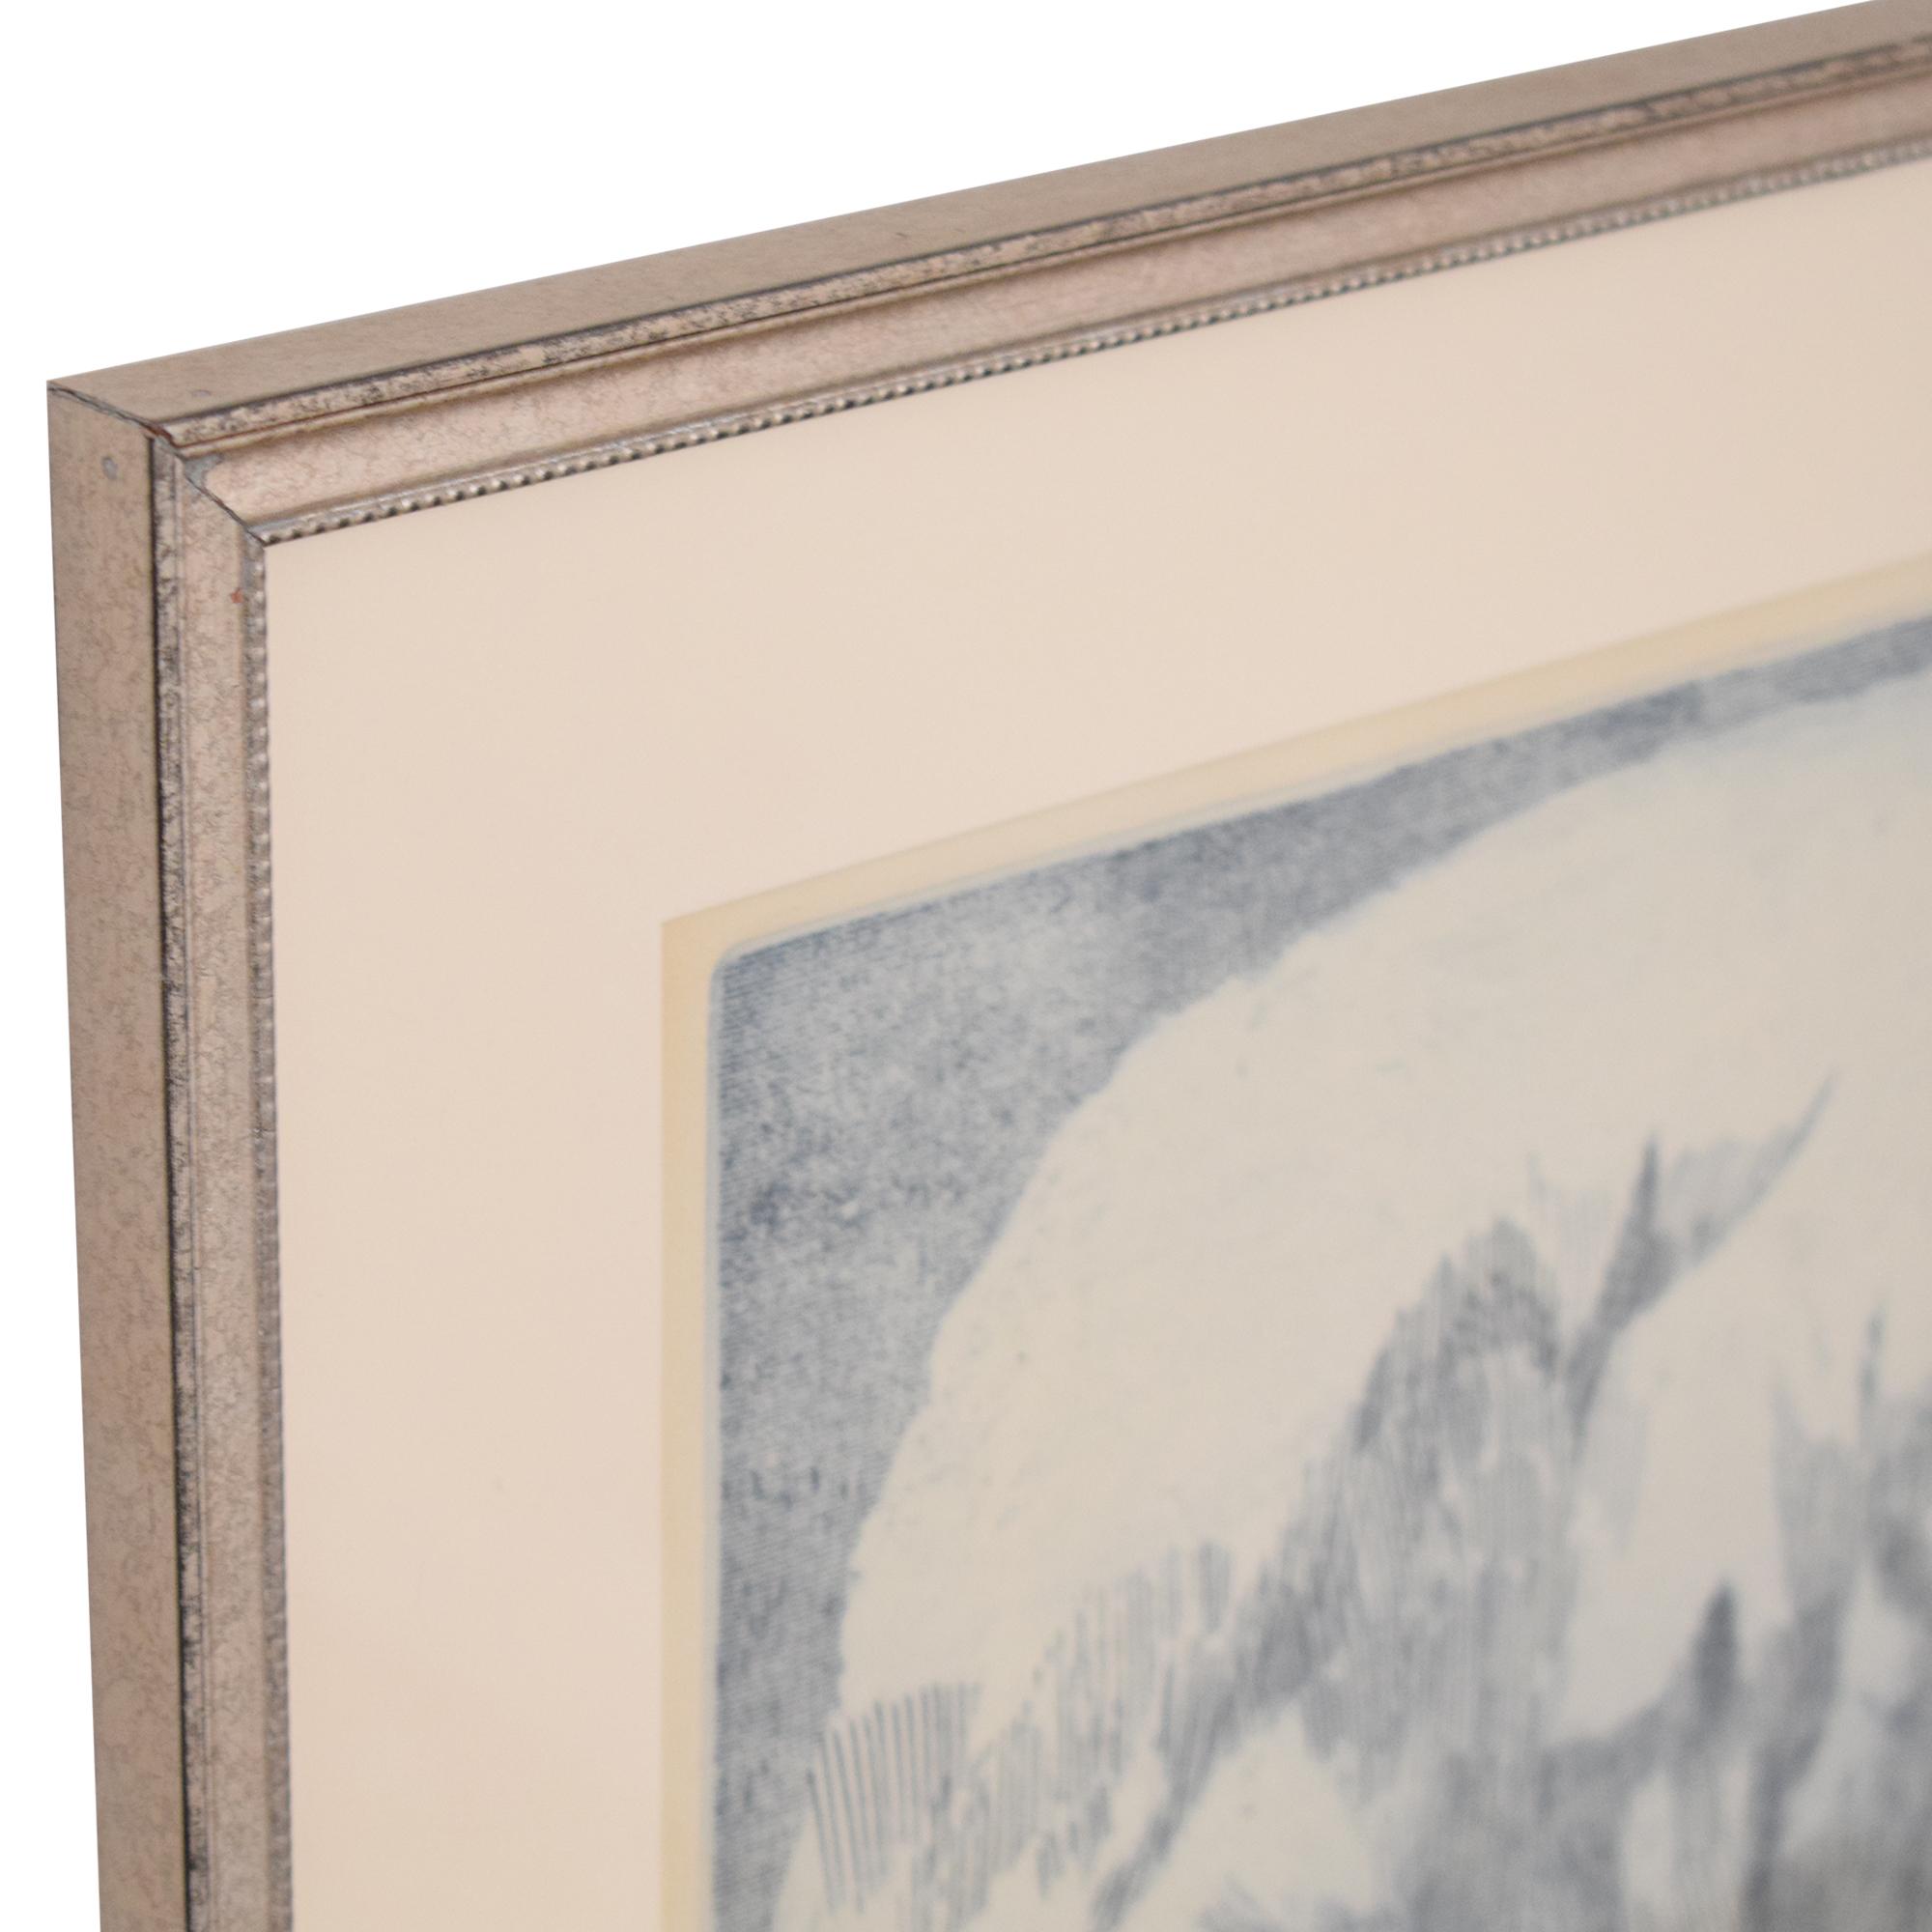 Framed Harold Altman Wall Art sale